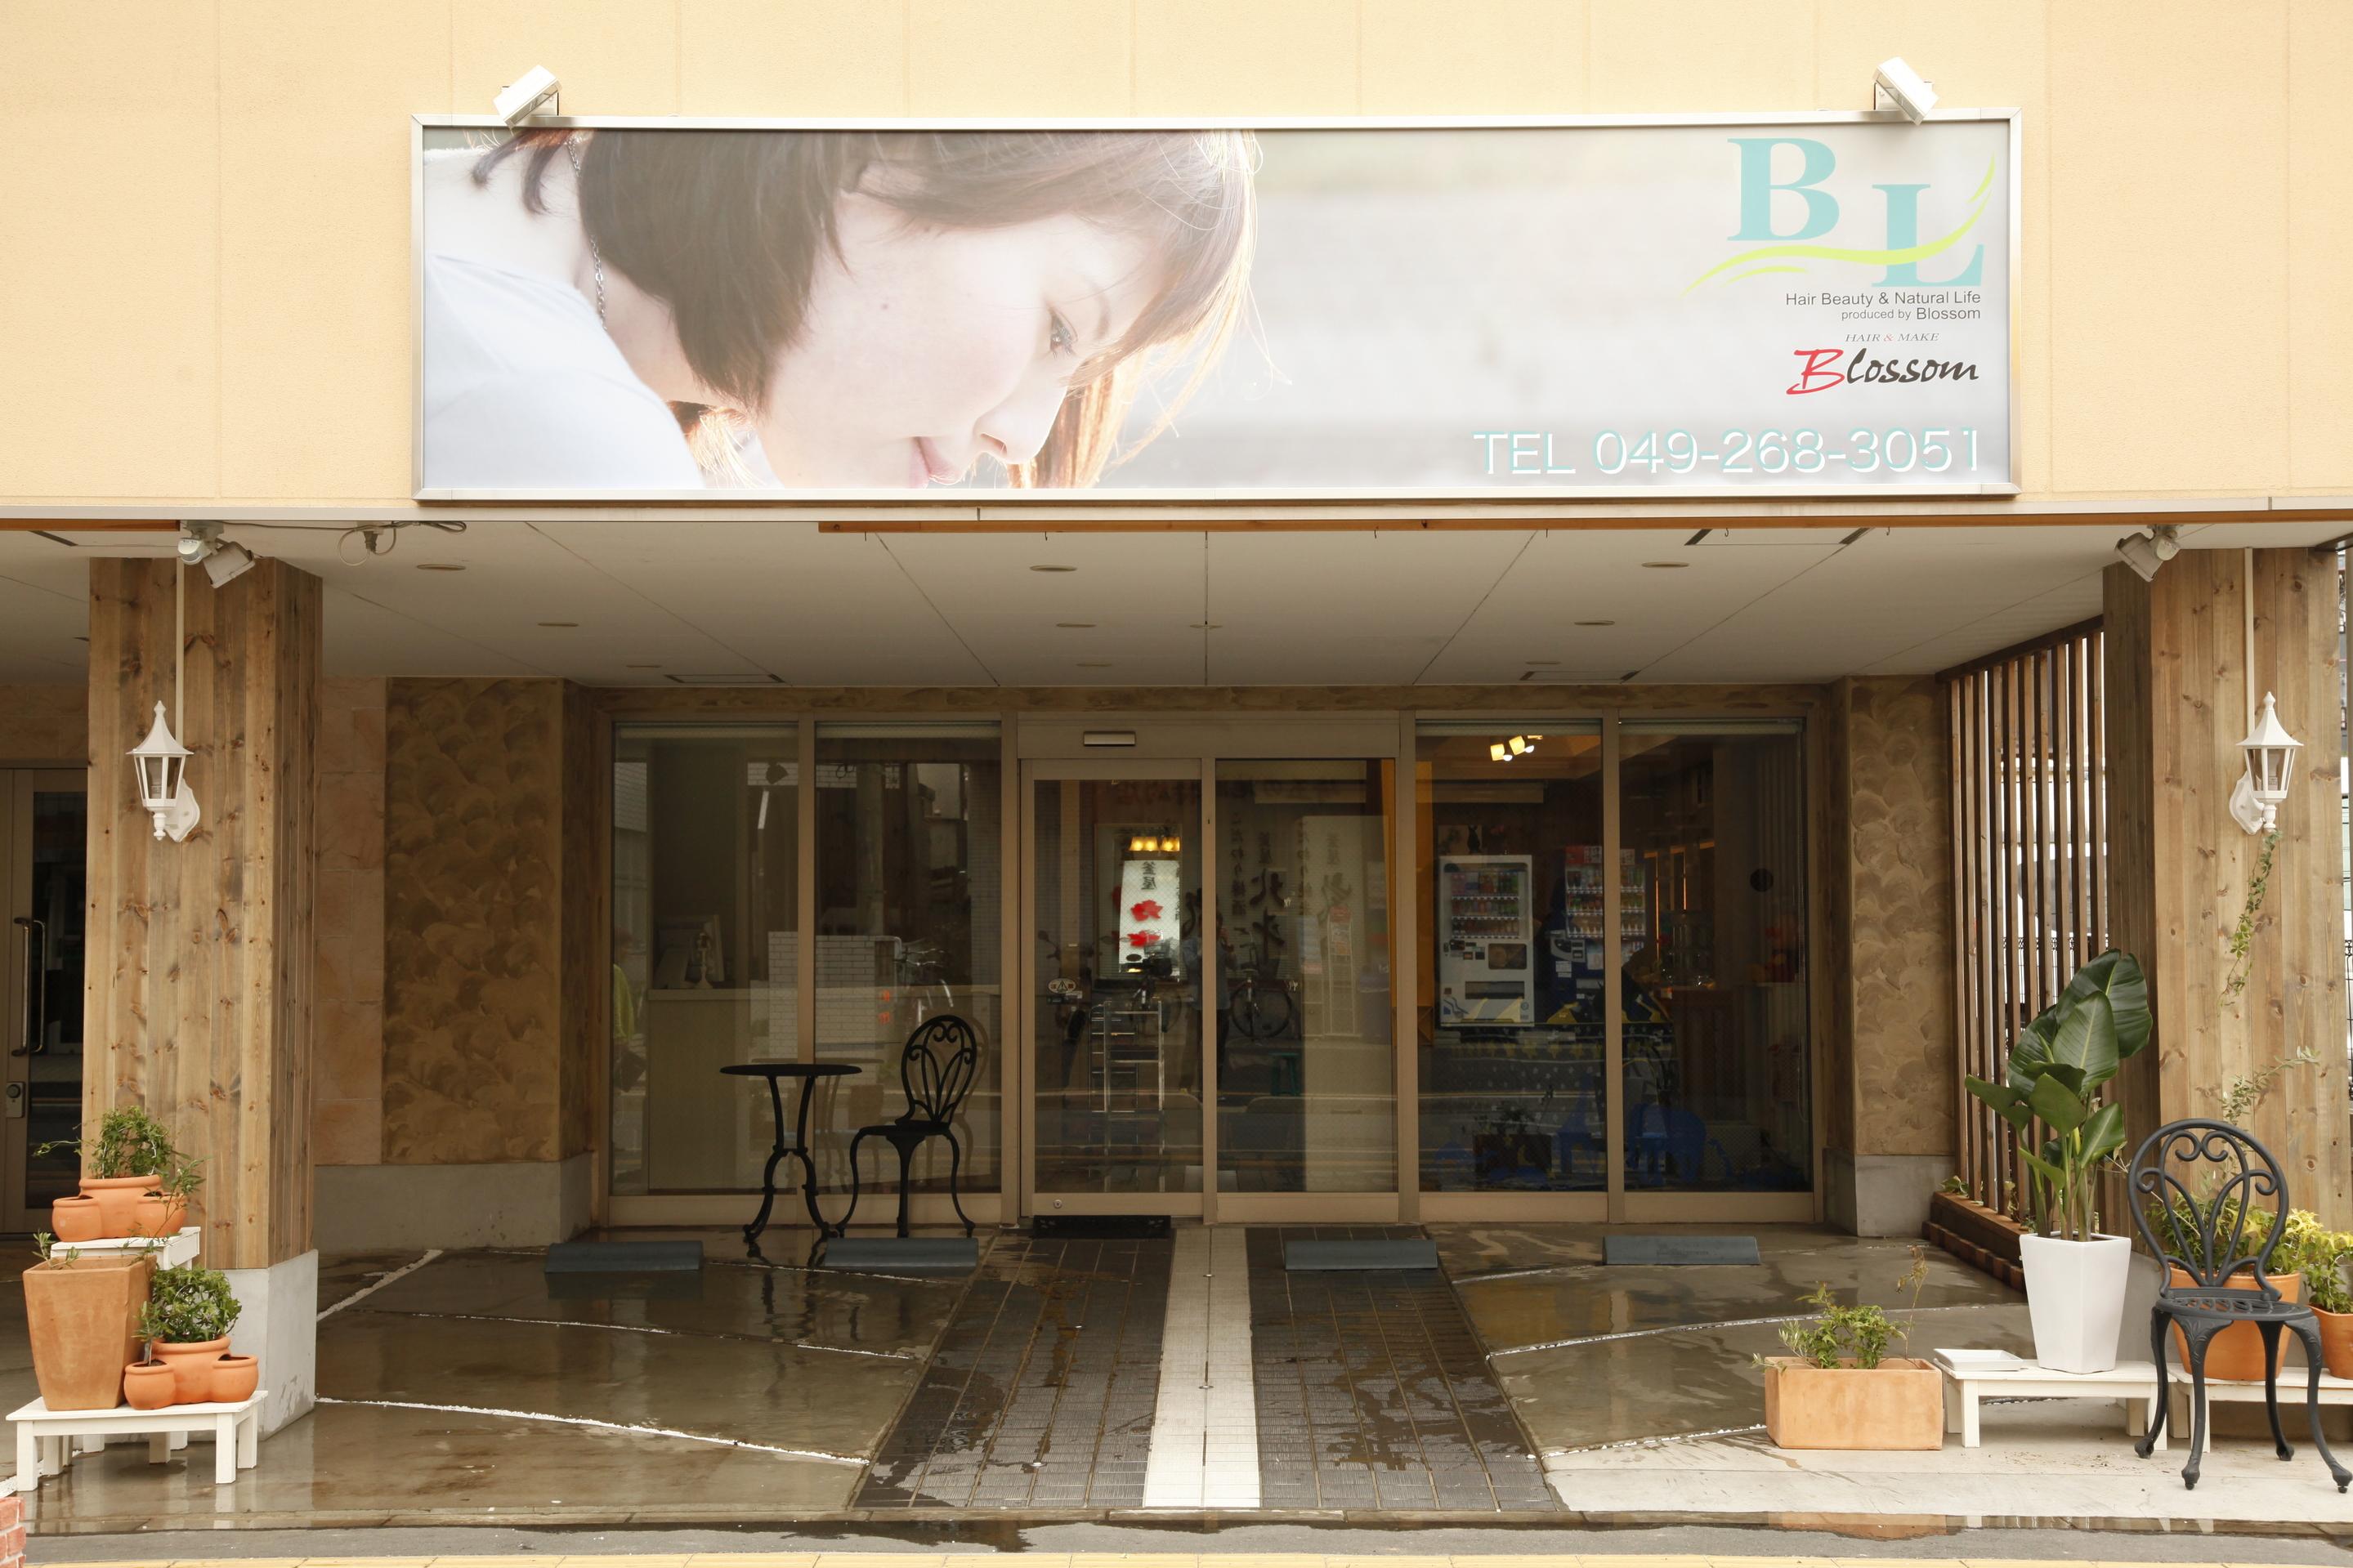 BLBLOSSOM 鶴瀬西口店